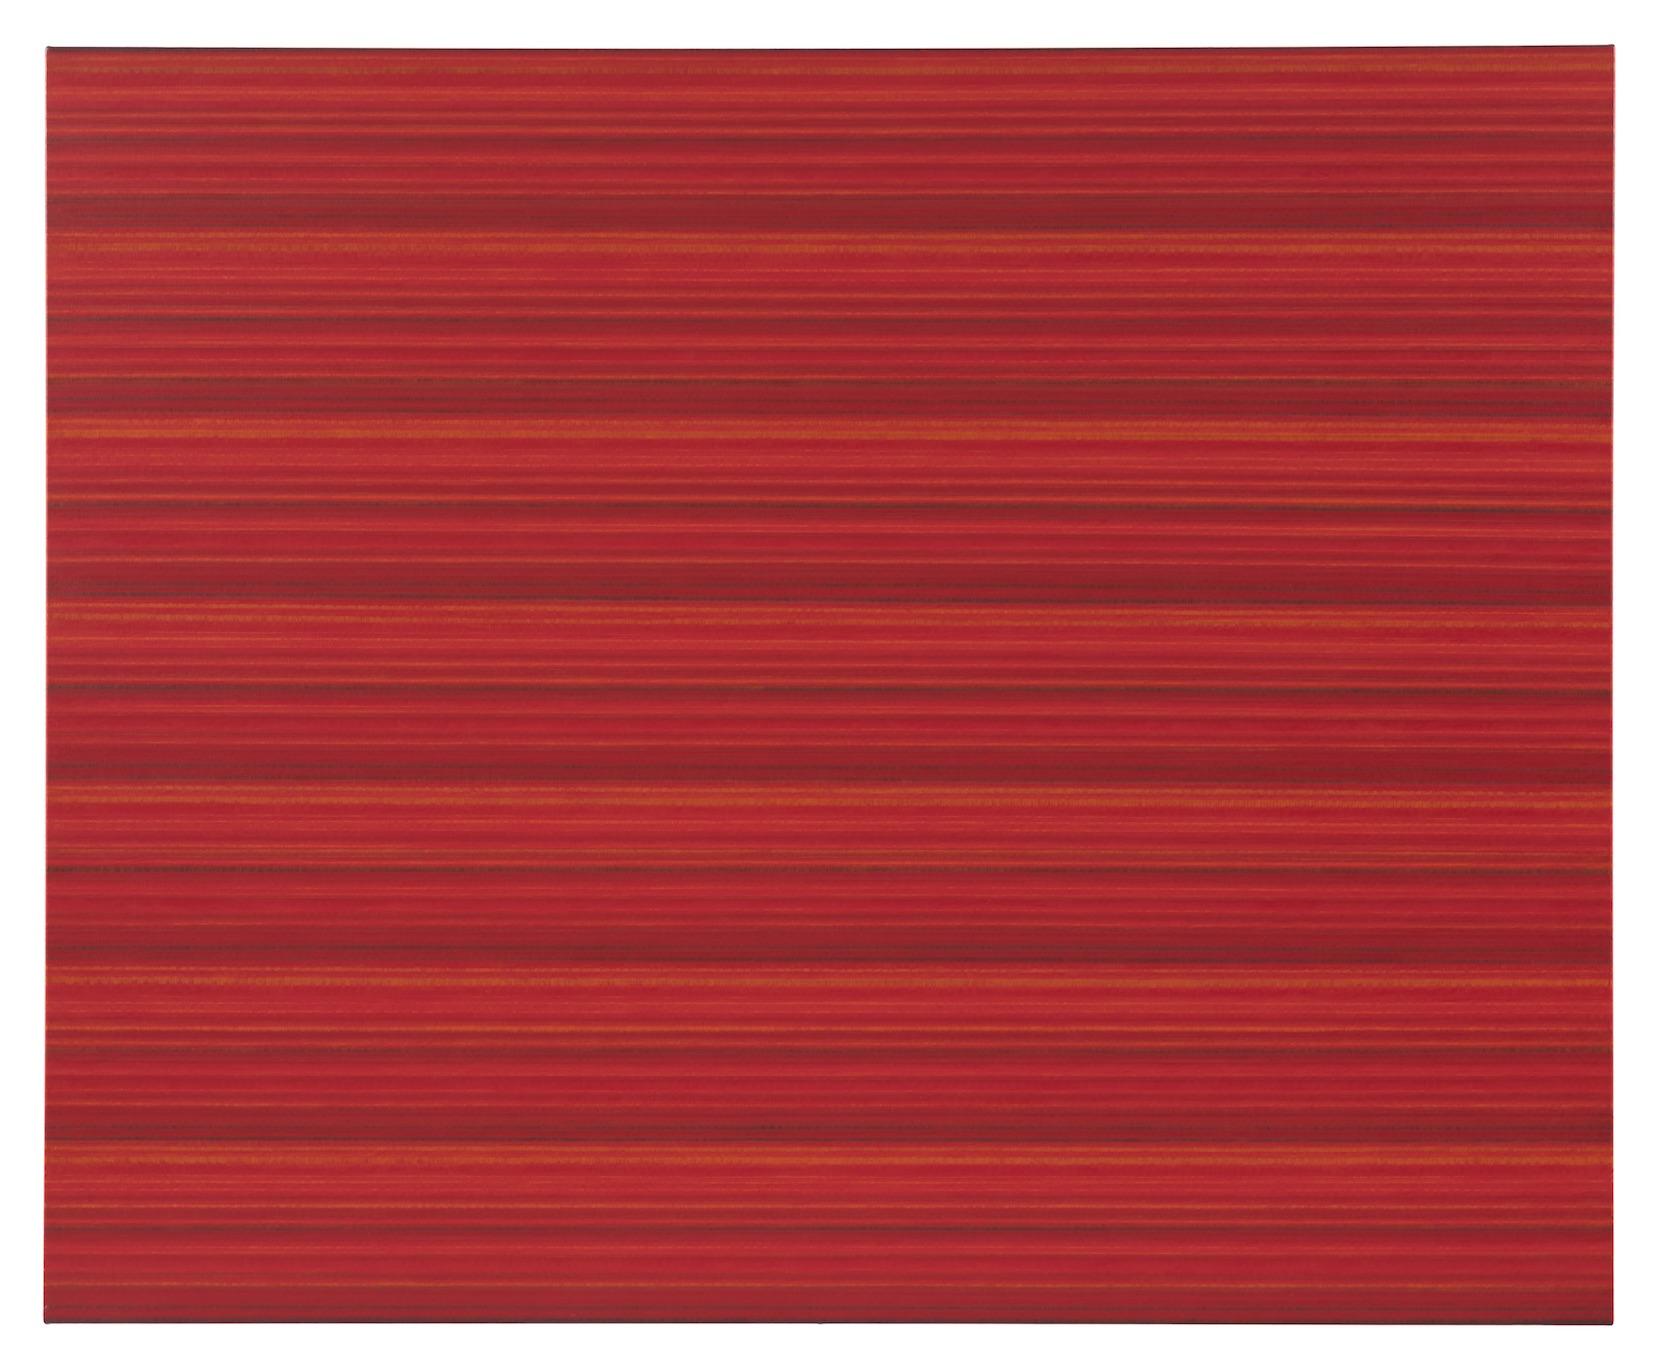 "Rickard Sollman, ""syskonet (röd)"", 2012, oil on canvas, 130 x 160 cm"